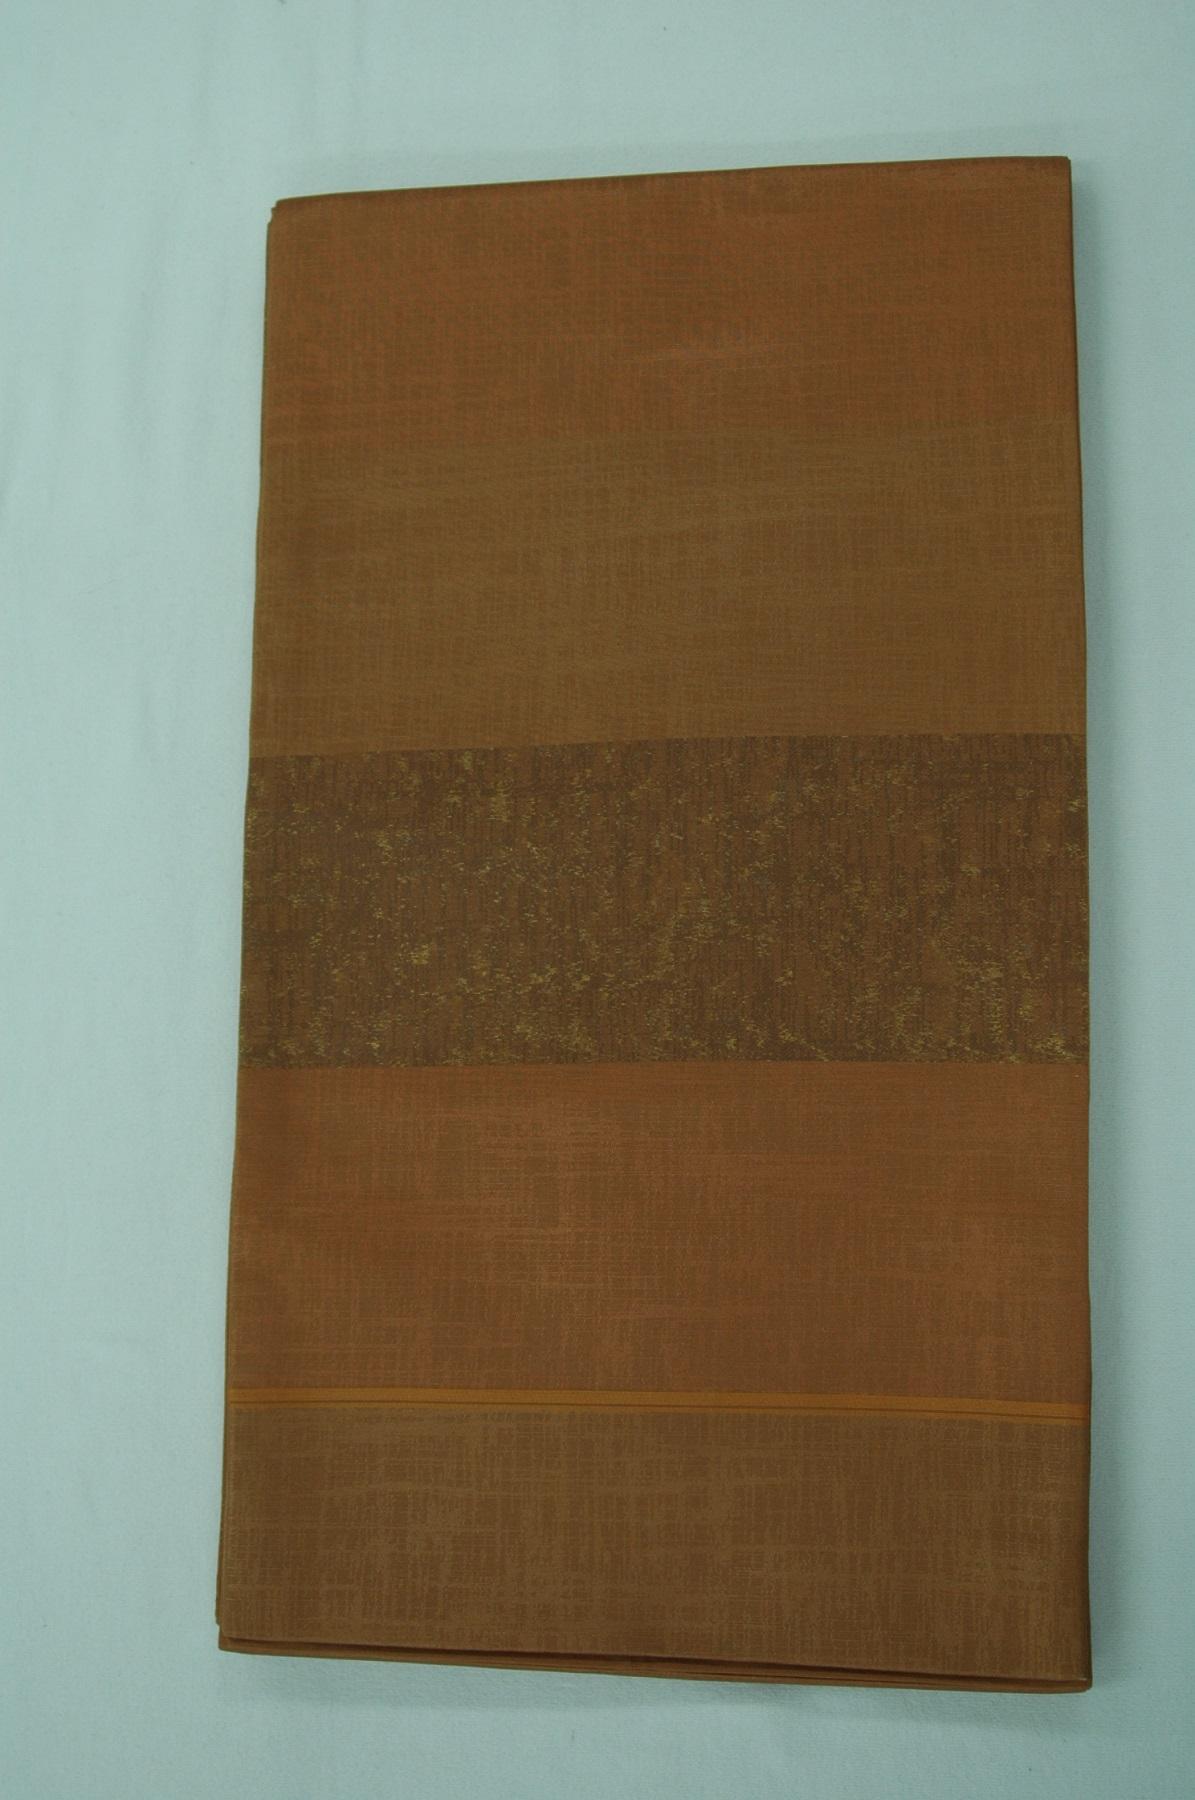 Monoki「モノキ」 【仕立て上がり 袋帯 薄茶色 2139】 着物リメイク&リユース リサイクル